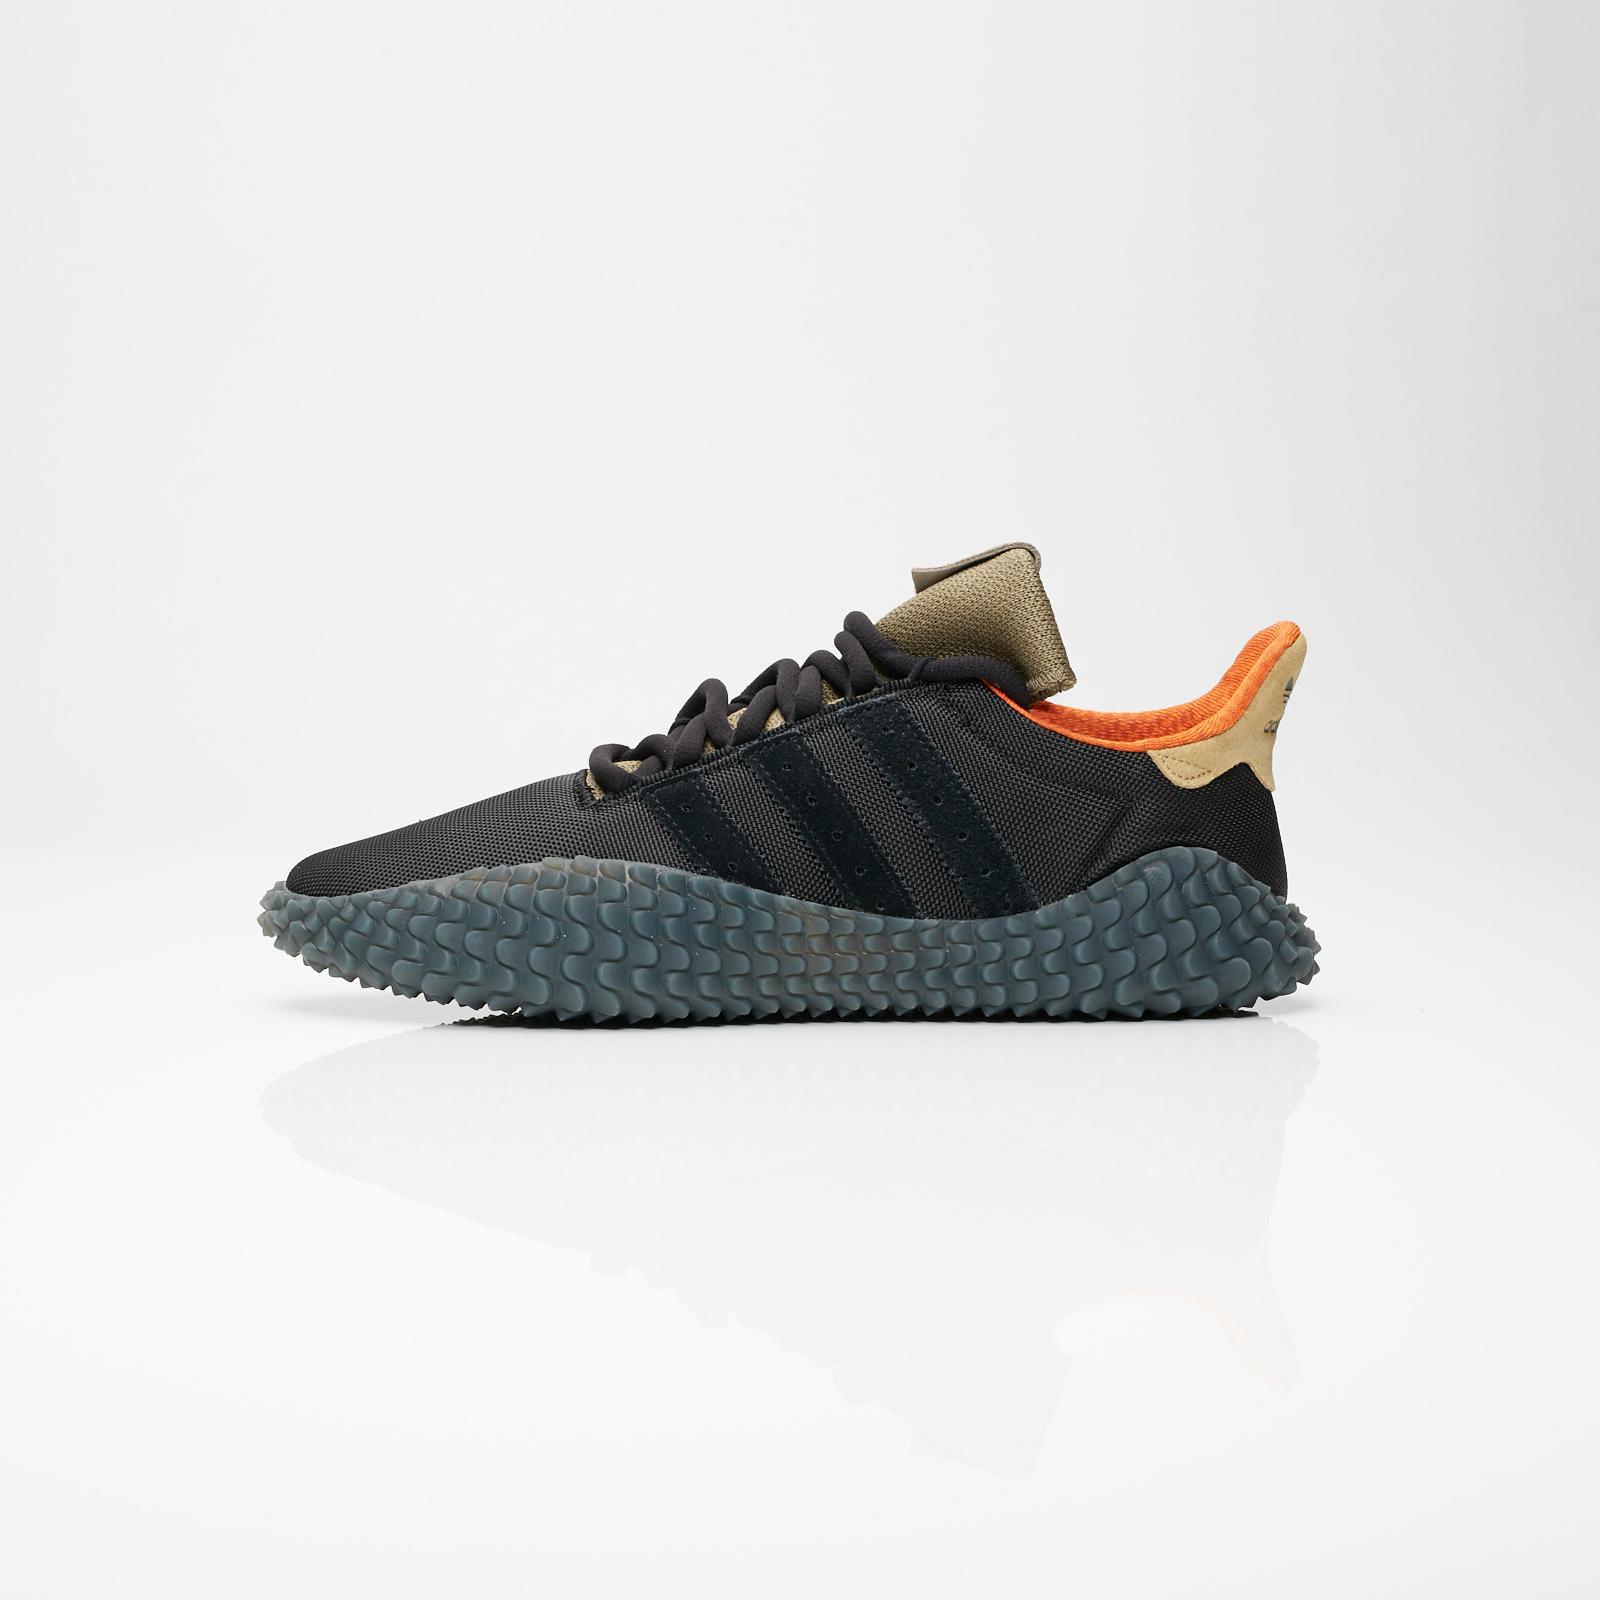 566673212 adidas Kamanda x Bodega - Bb9243 - Sneakersnstuff